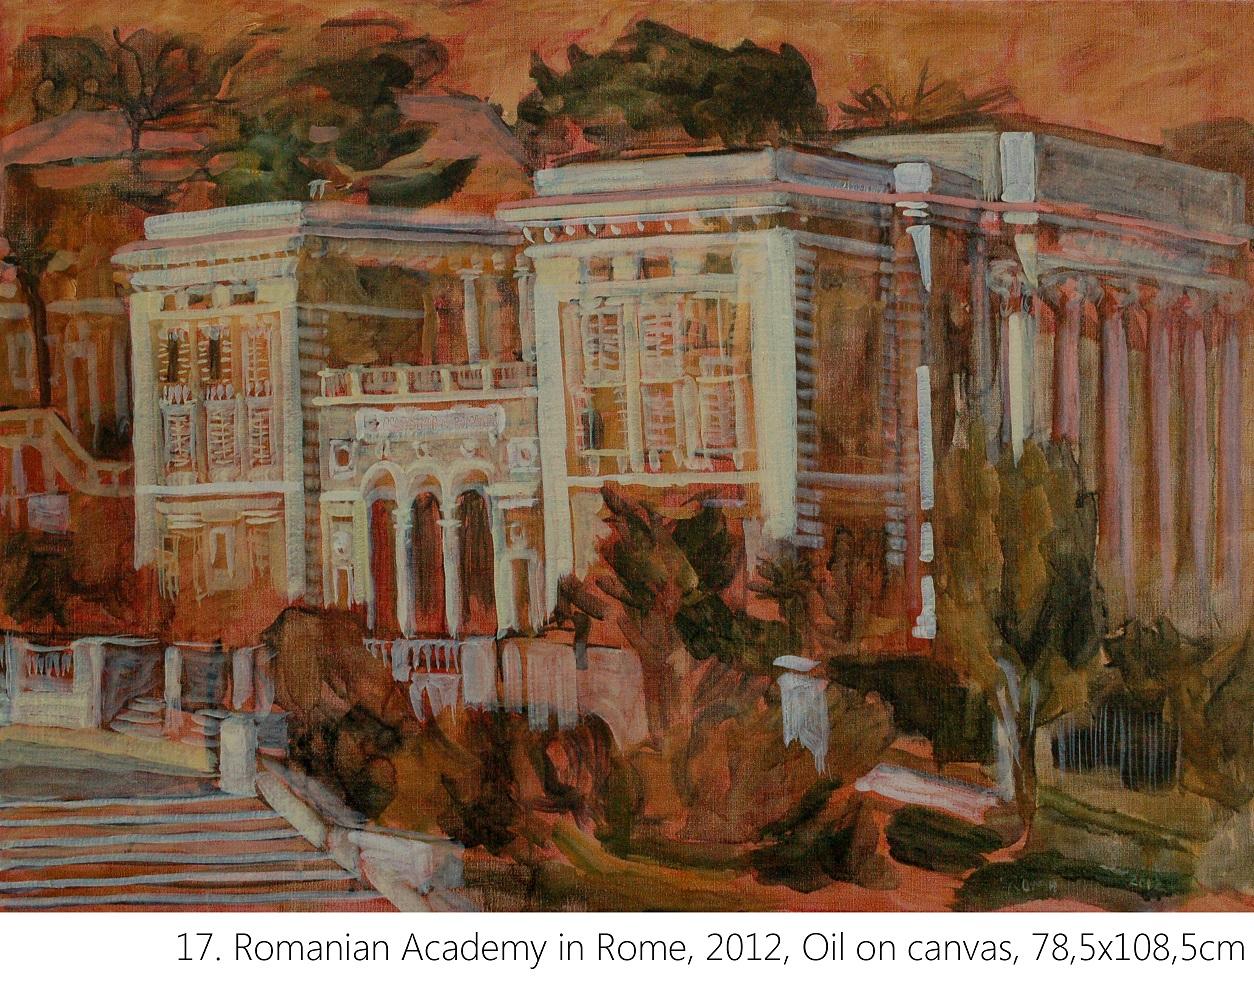 17. Romanian Academy in Rome, 2012, Oil on canvas, 78,5x108,5cm